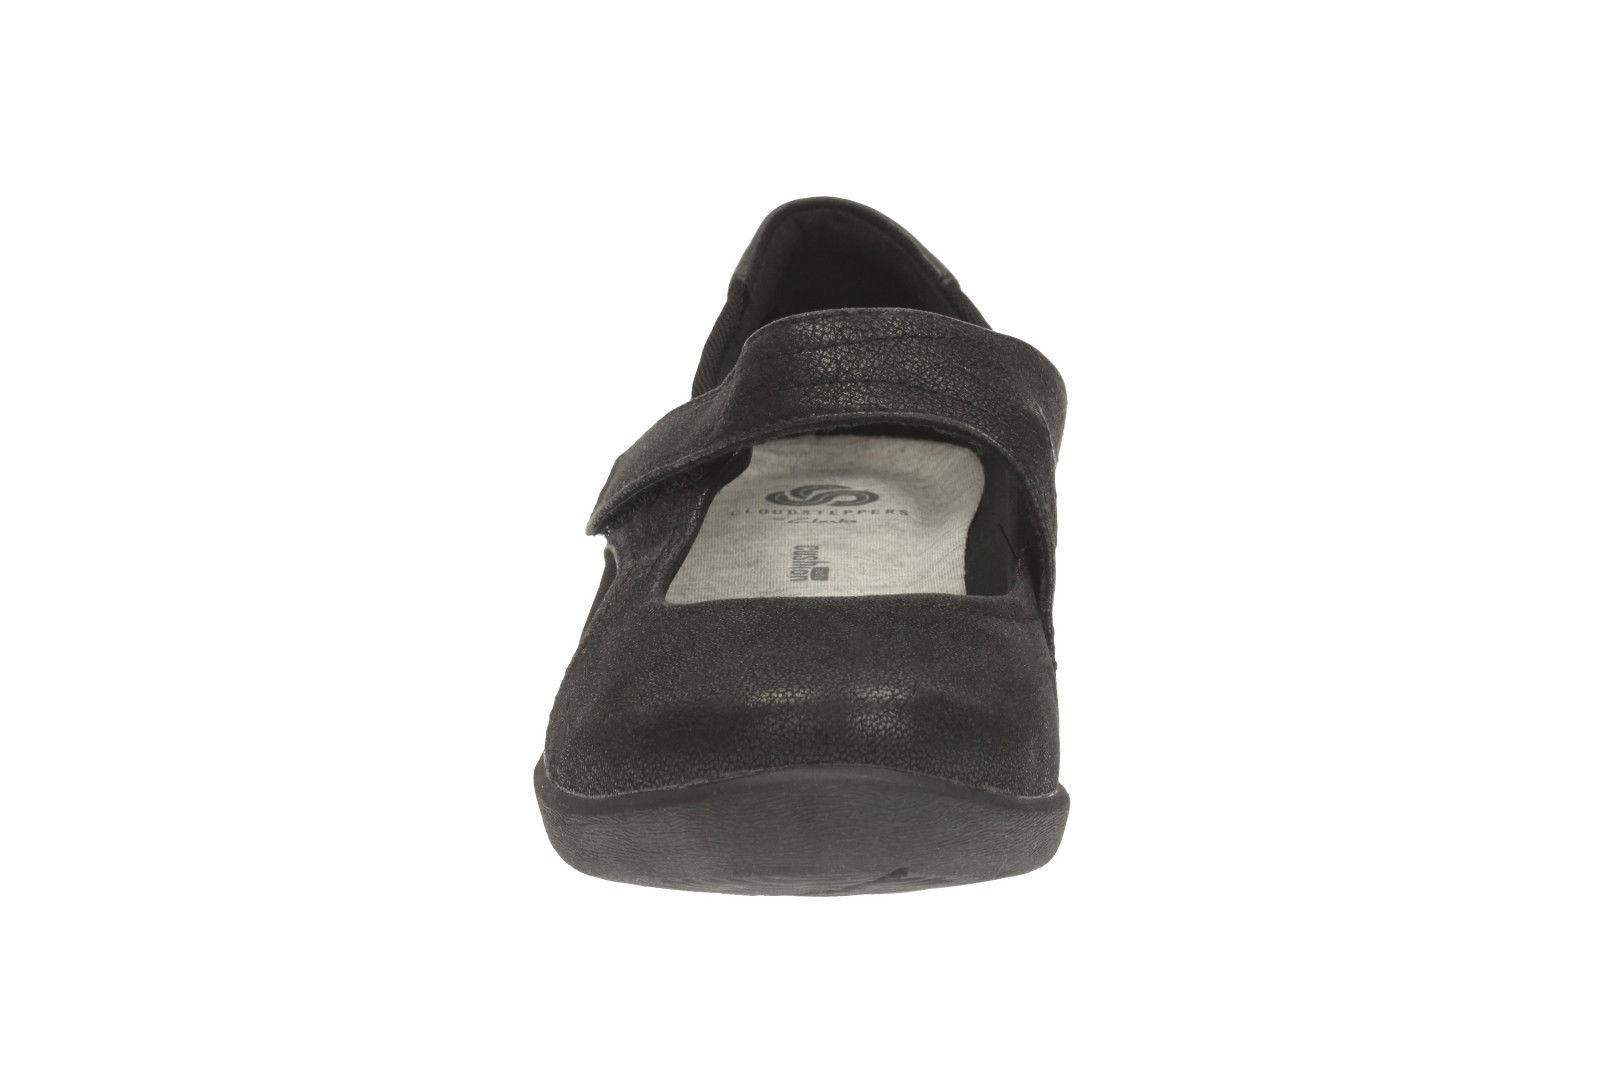 Clarks Artisan Mary Jane Nubuck Shoes